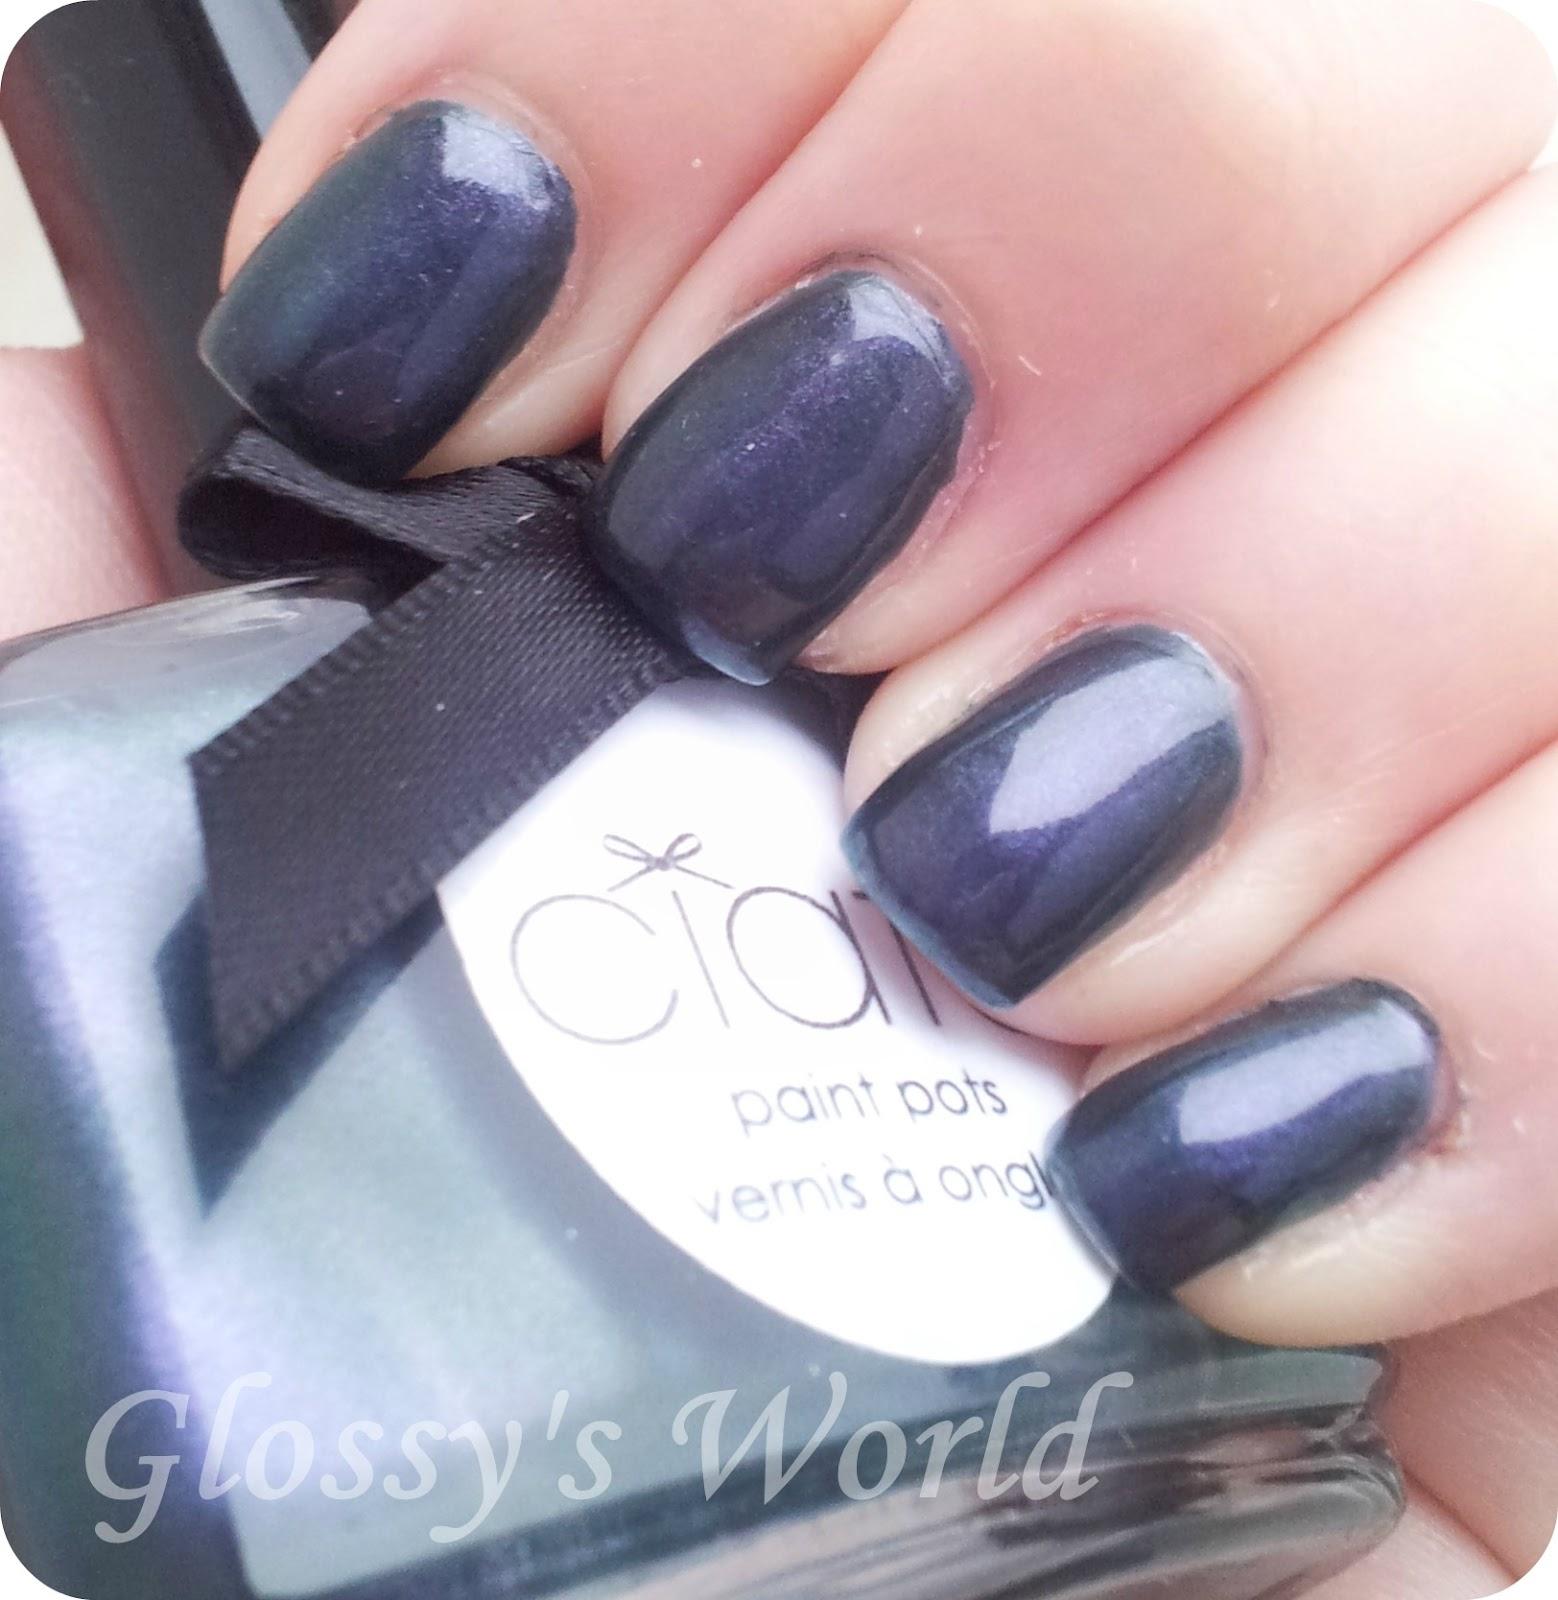 Ciate Starlet: Glossy's World: Juni 2012